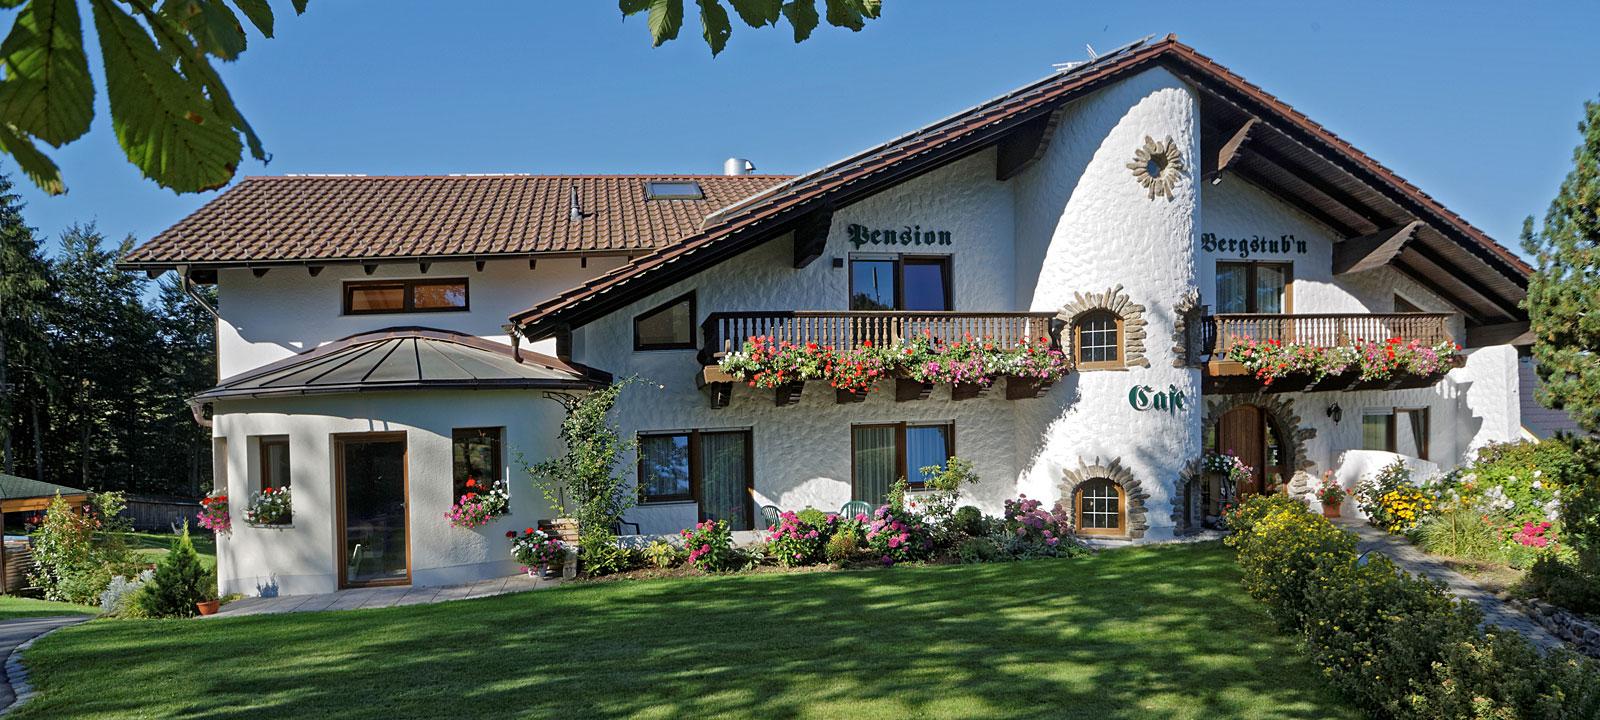 Pension Bergstubn in Saldenburg im Dreiburgenland